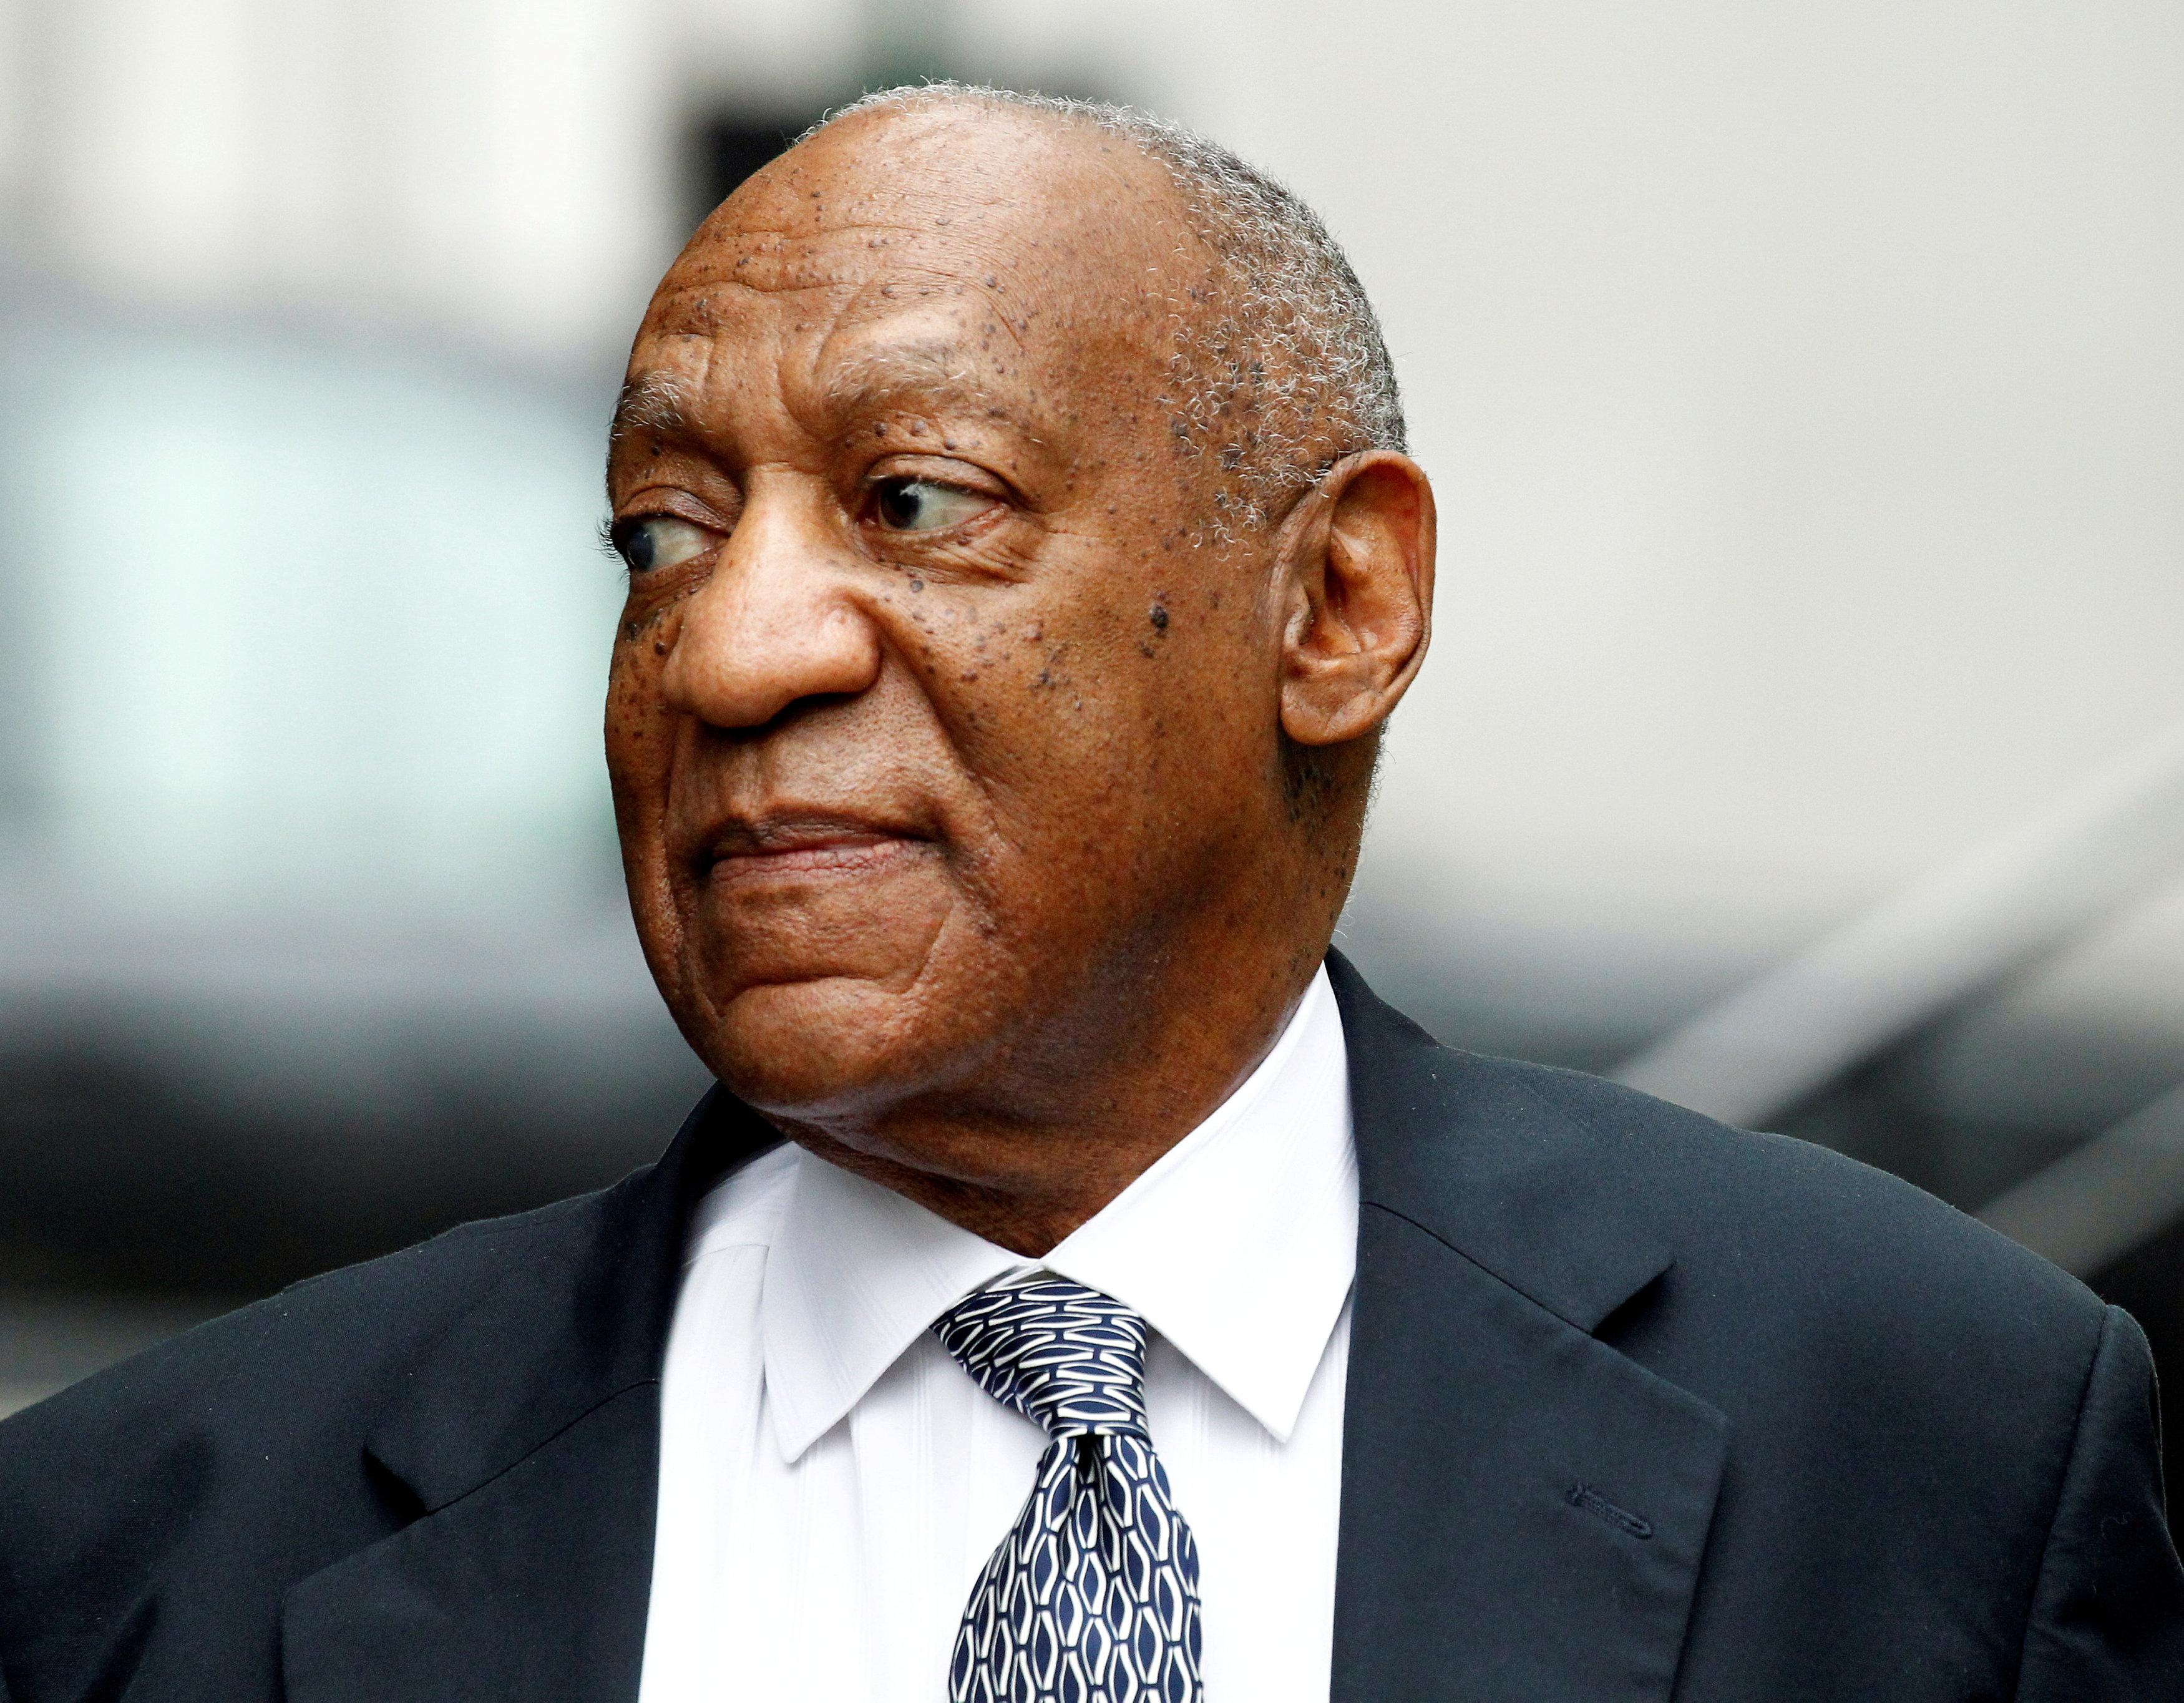 Pennsylvania judge delays Cosby sex assault retrial till March